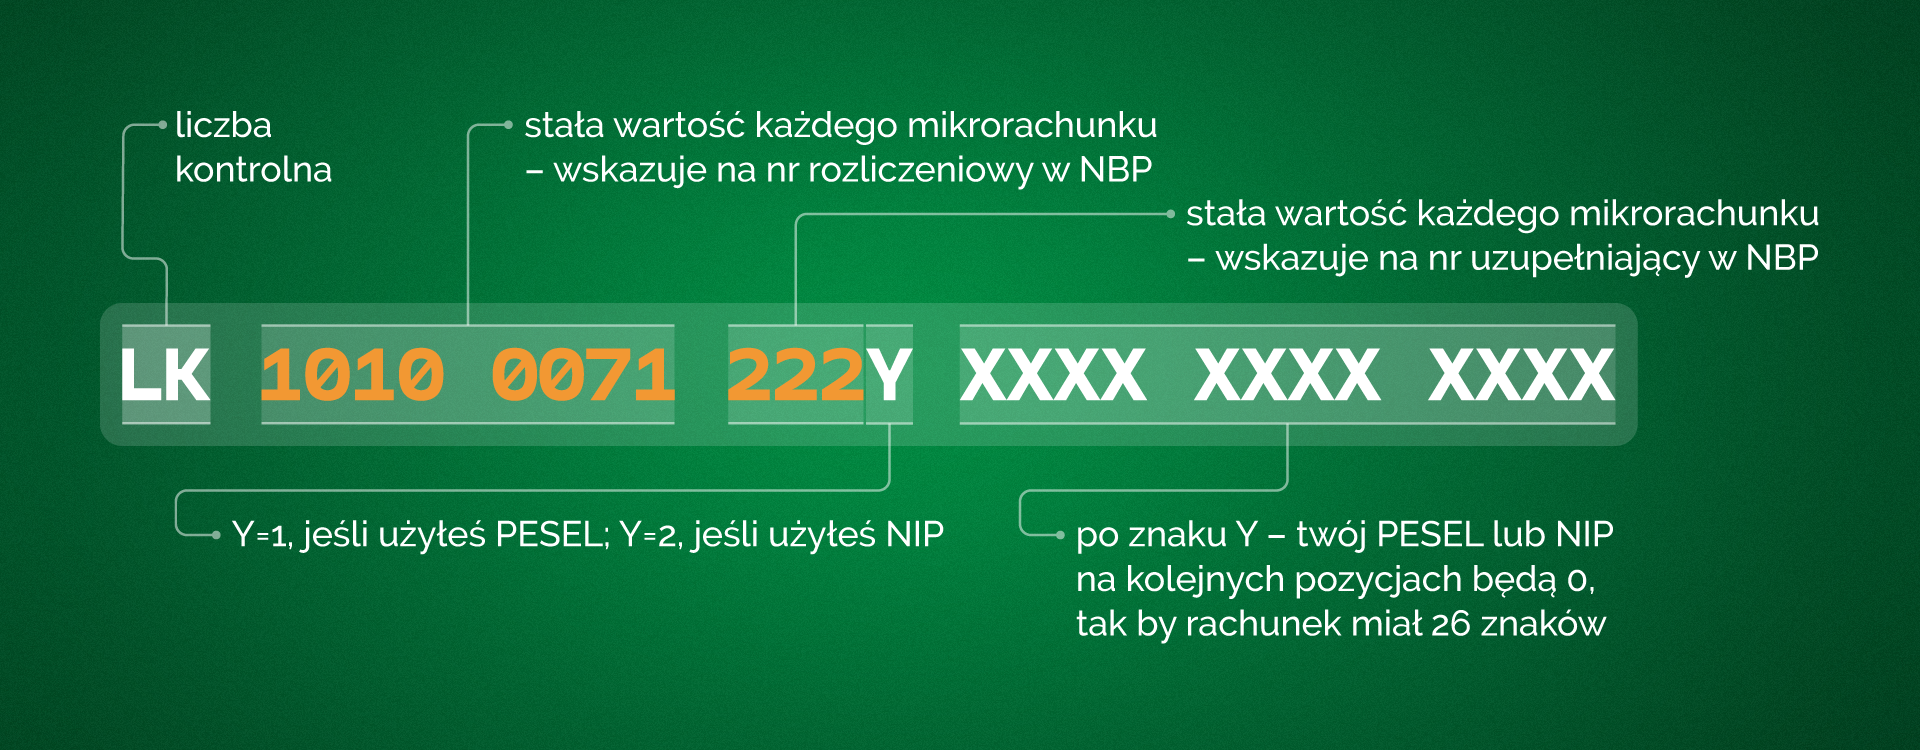 mp schemat z prezki Od 1 stycznia 2020 r. PIT, CIT i VAT na mikrorachunek podatkowy